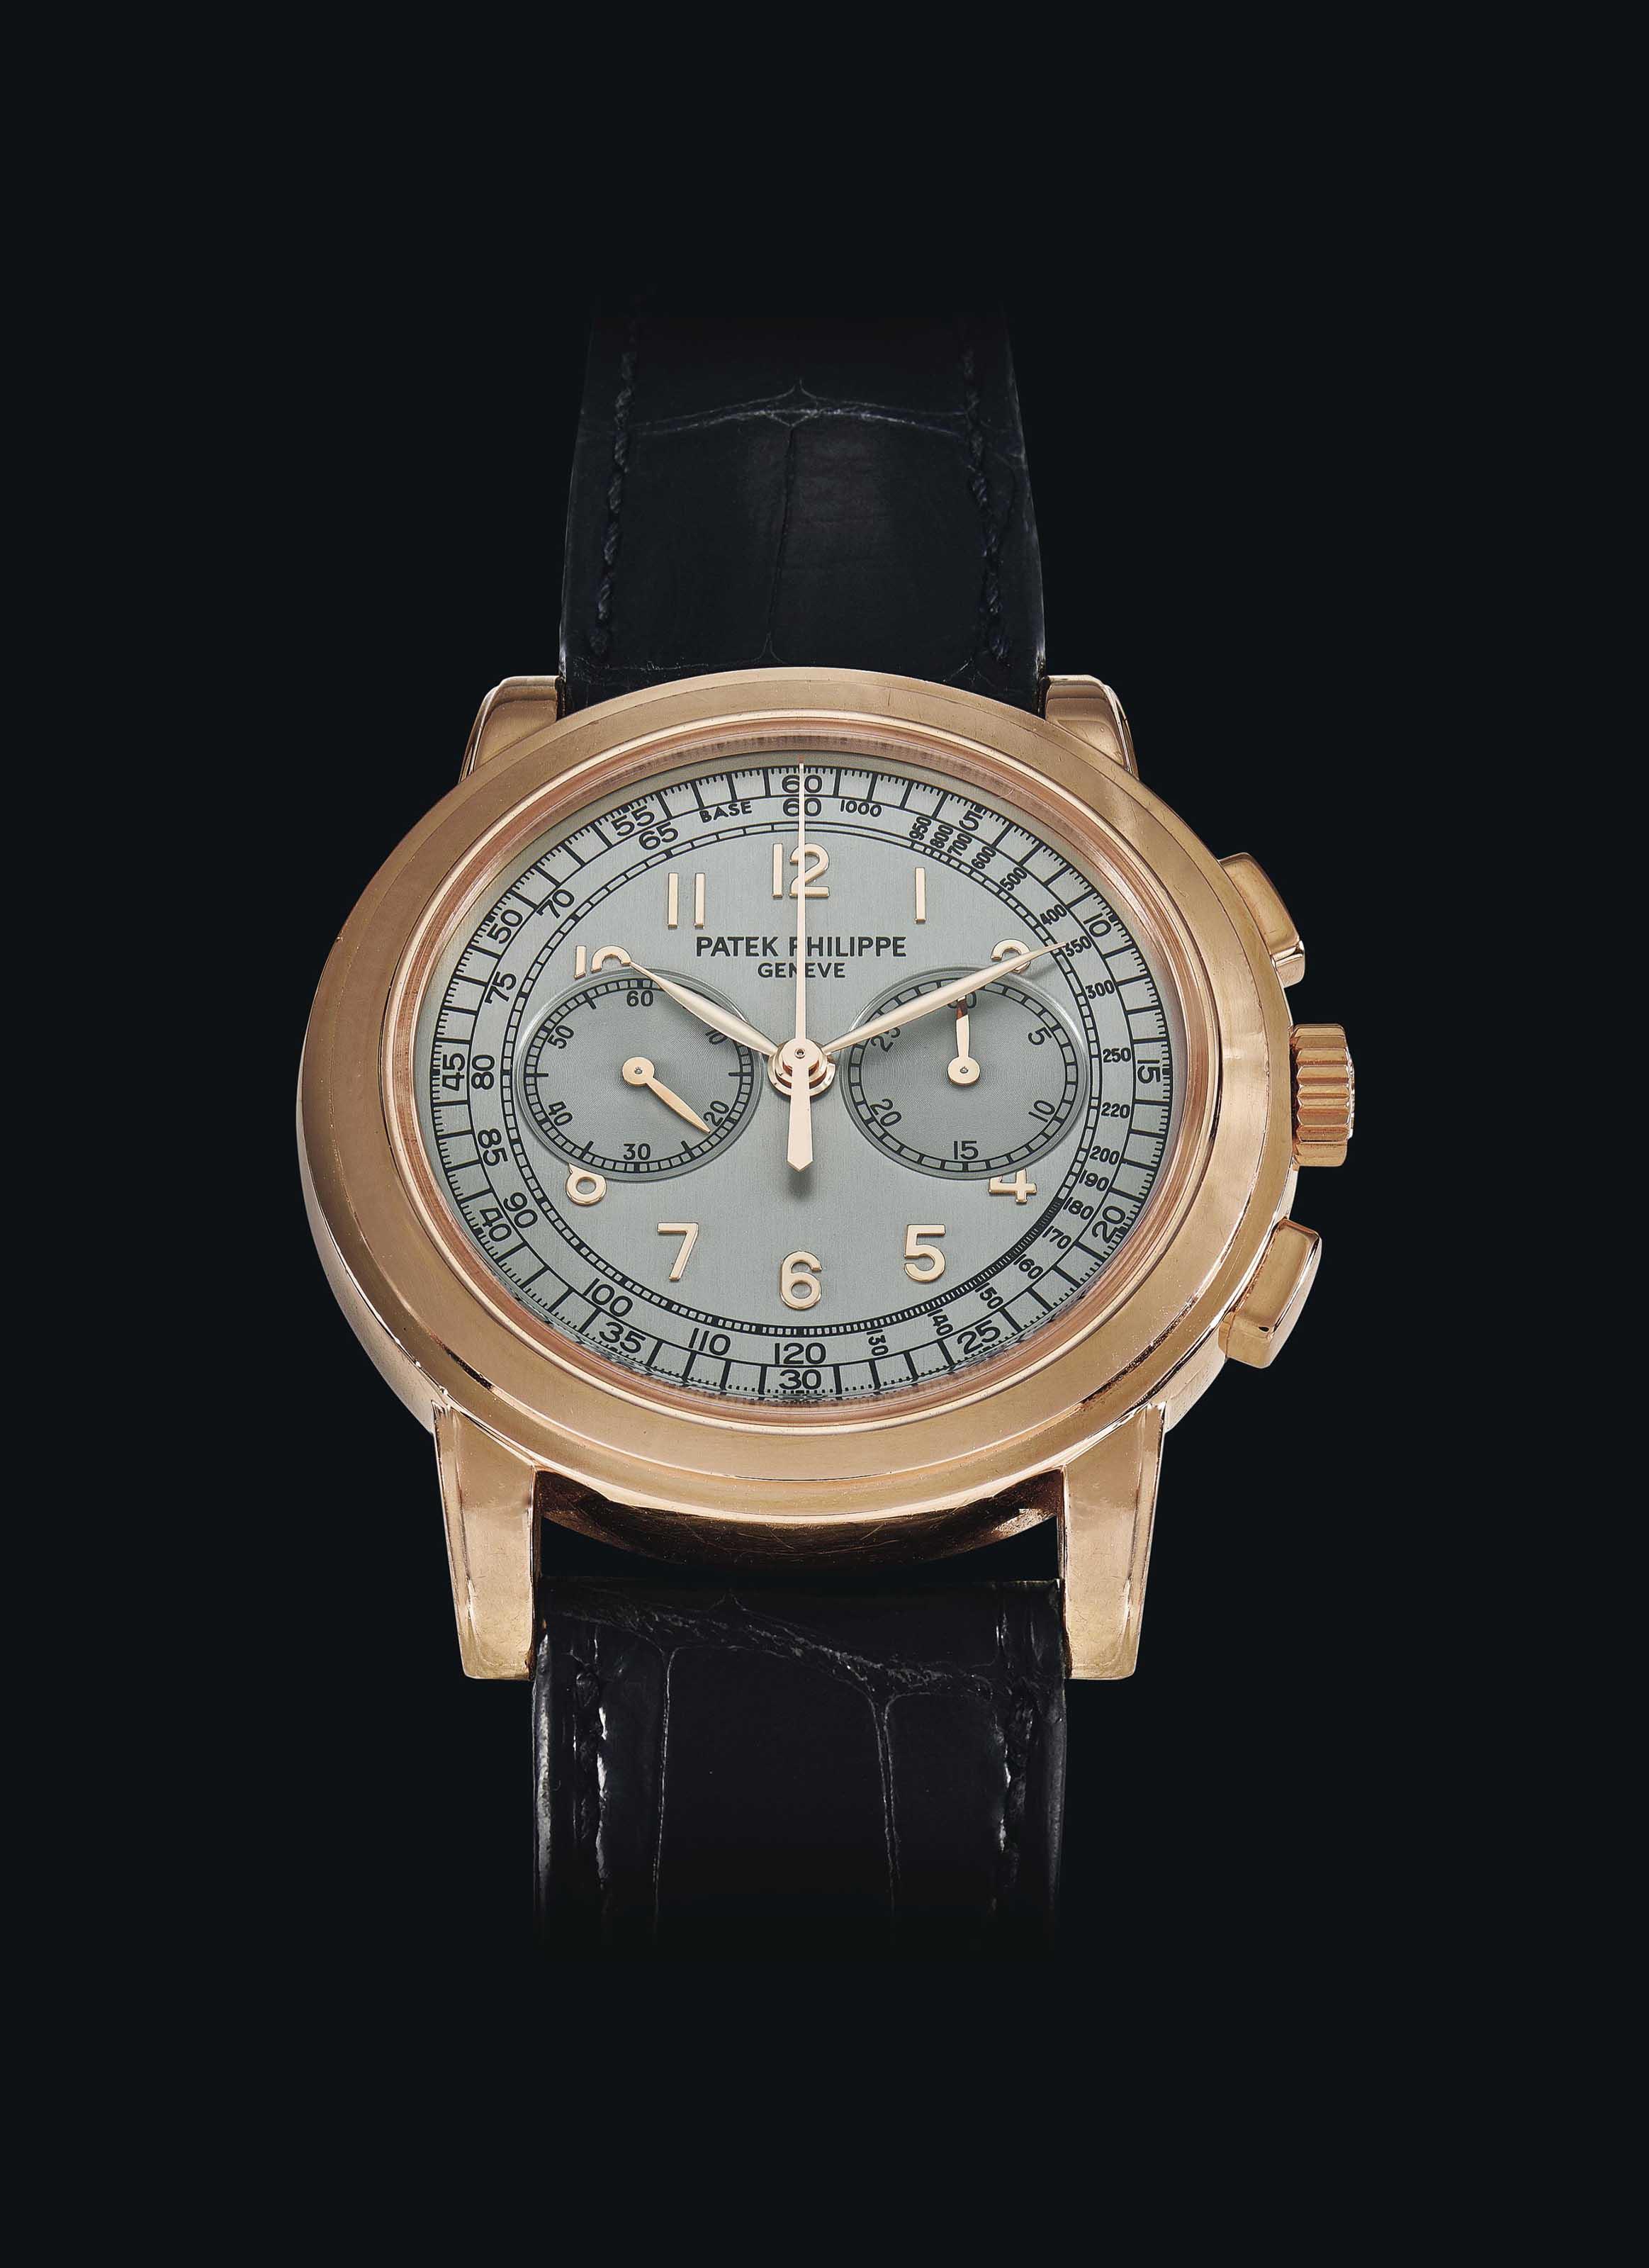 Patek philippe an 18k pink gold chronograph wristwatch signed patek philippe geneve ref for Patek philippe geneve